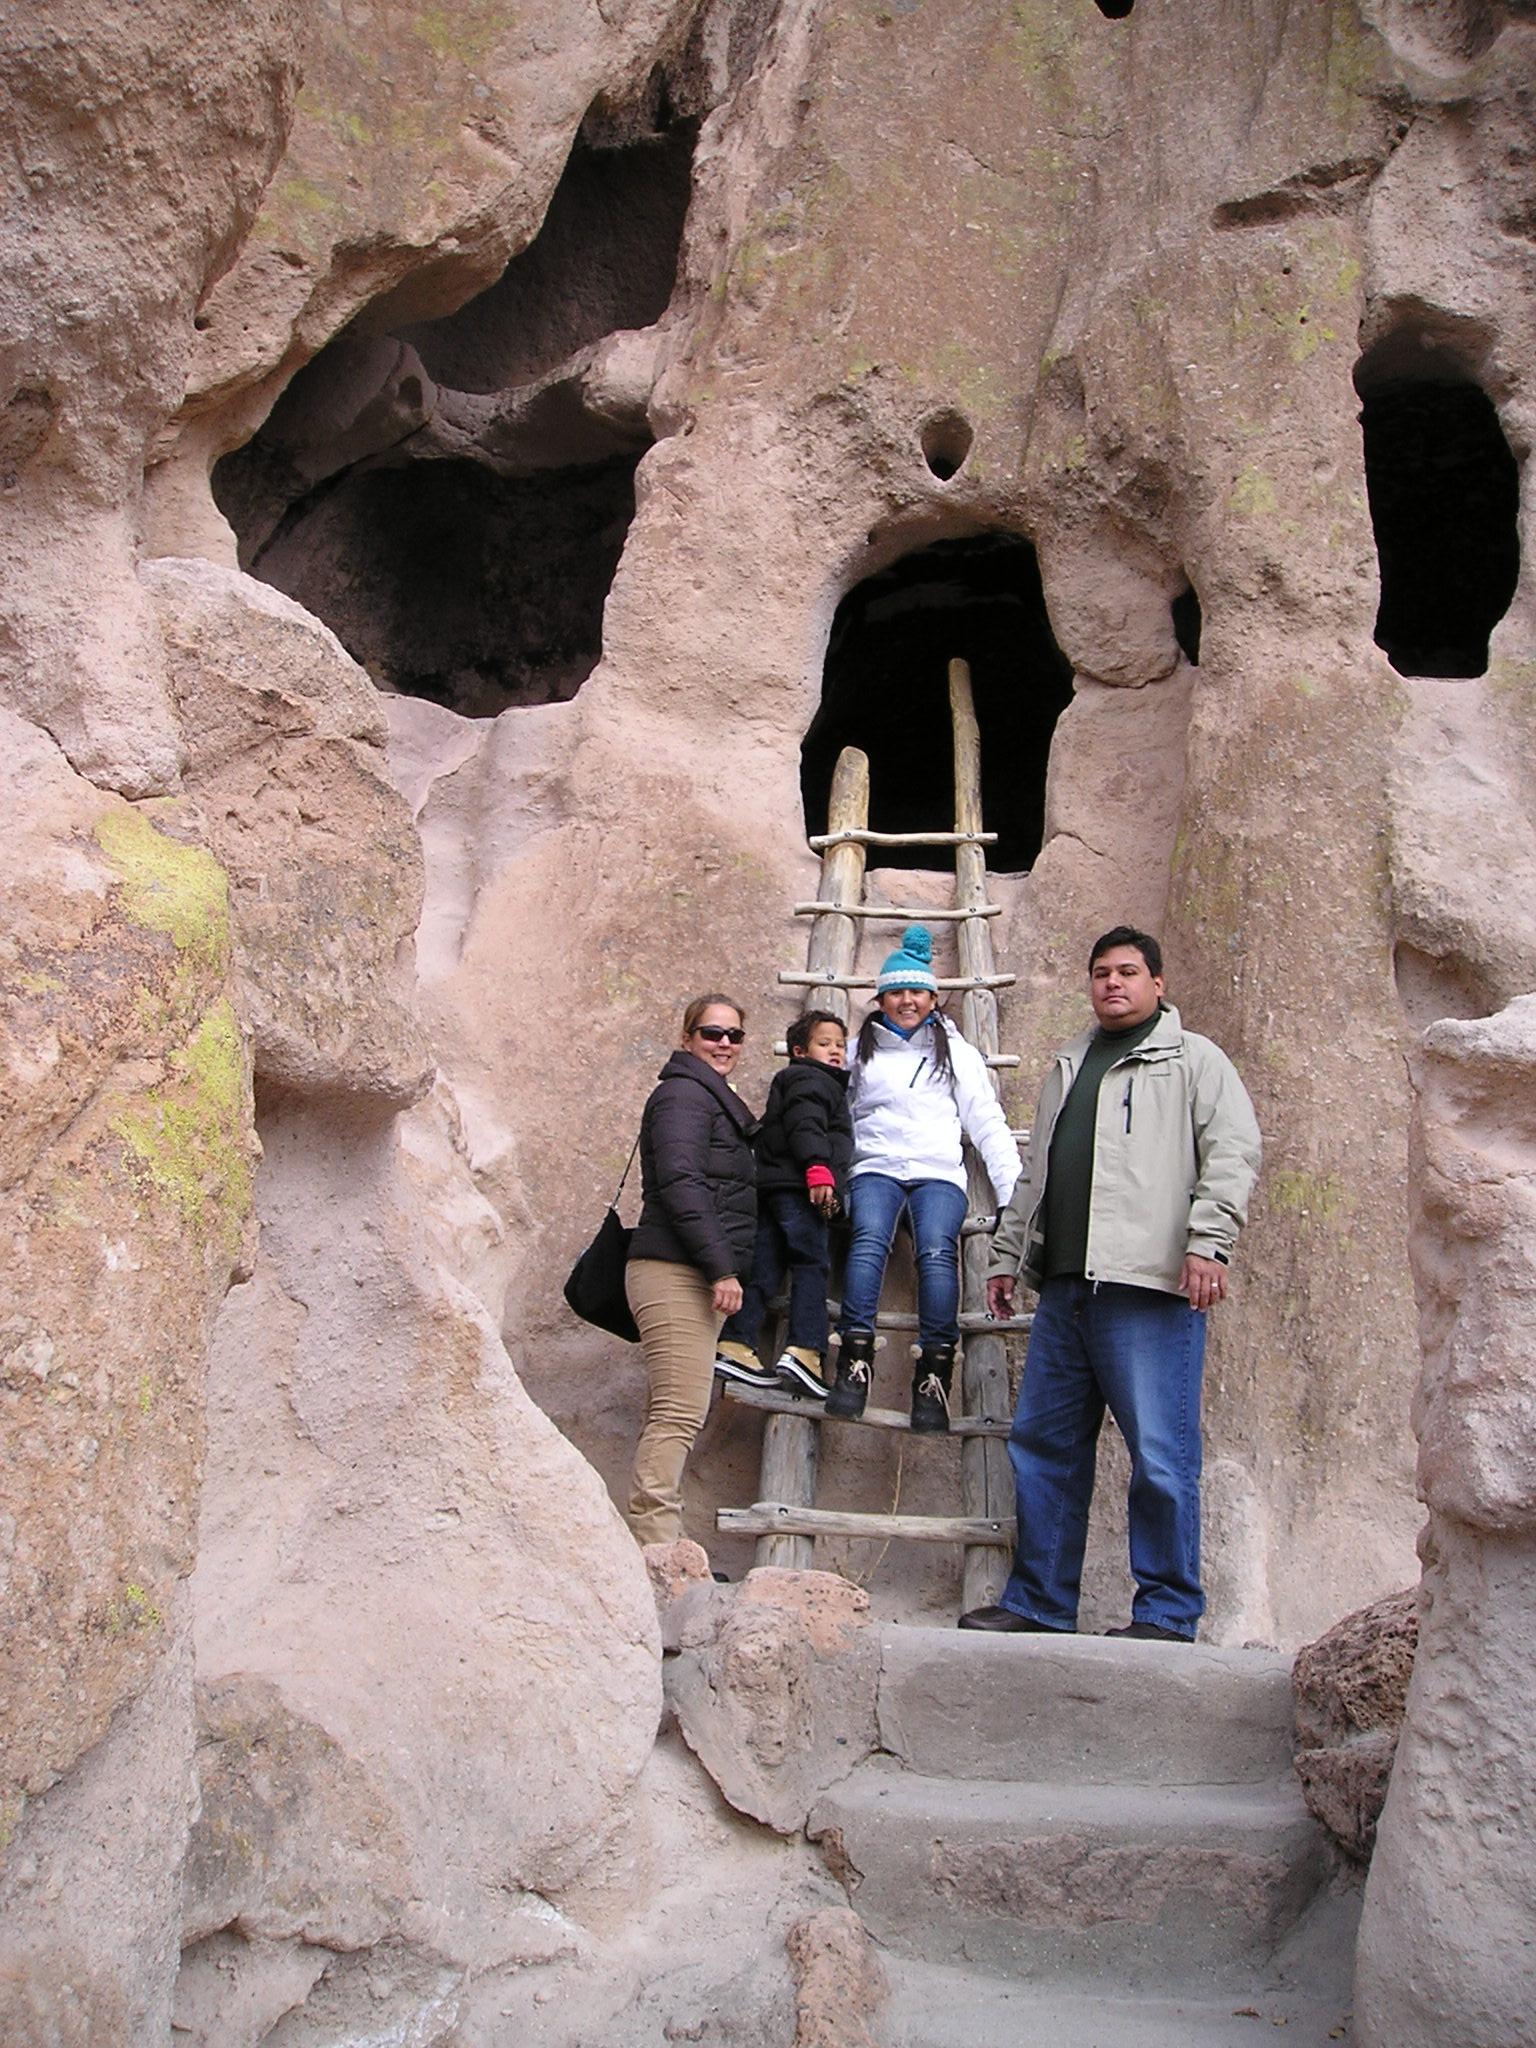 Family explores Bandelier National Park